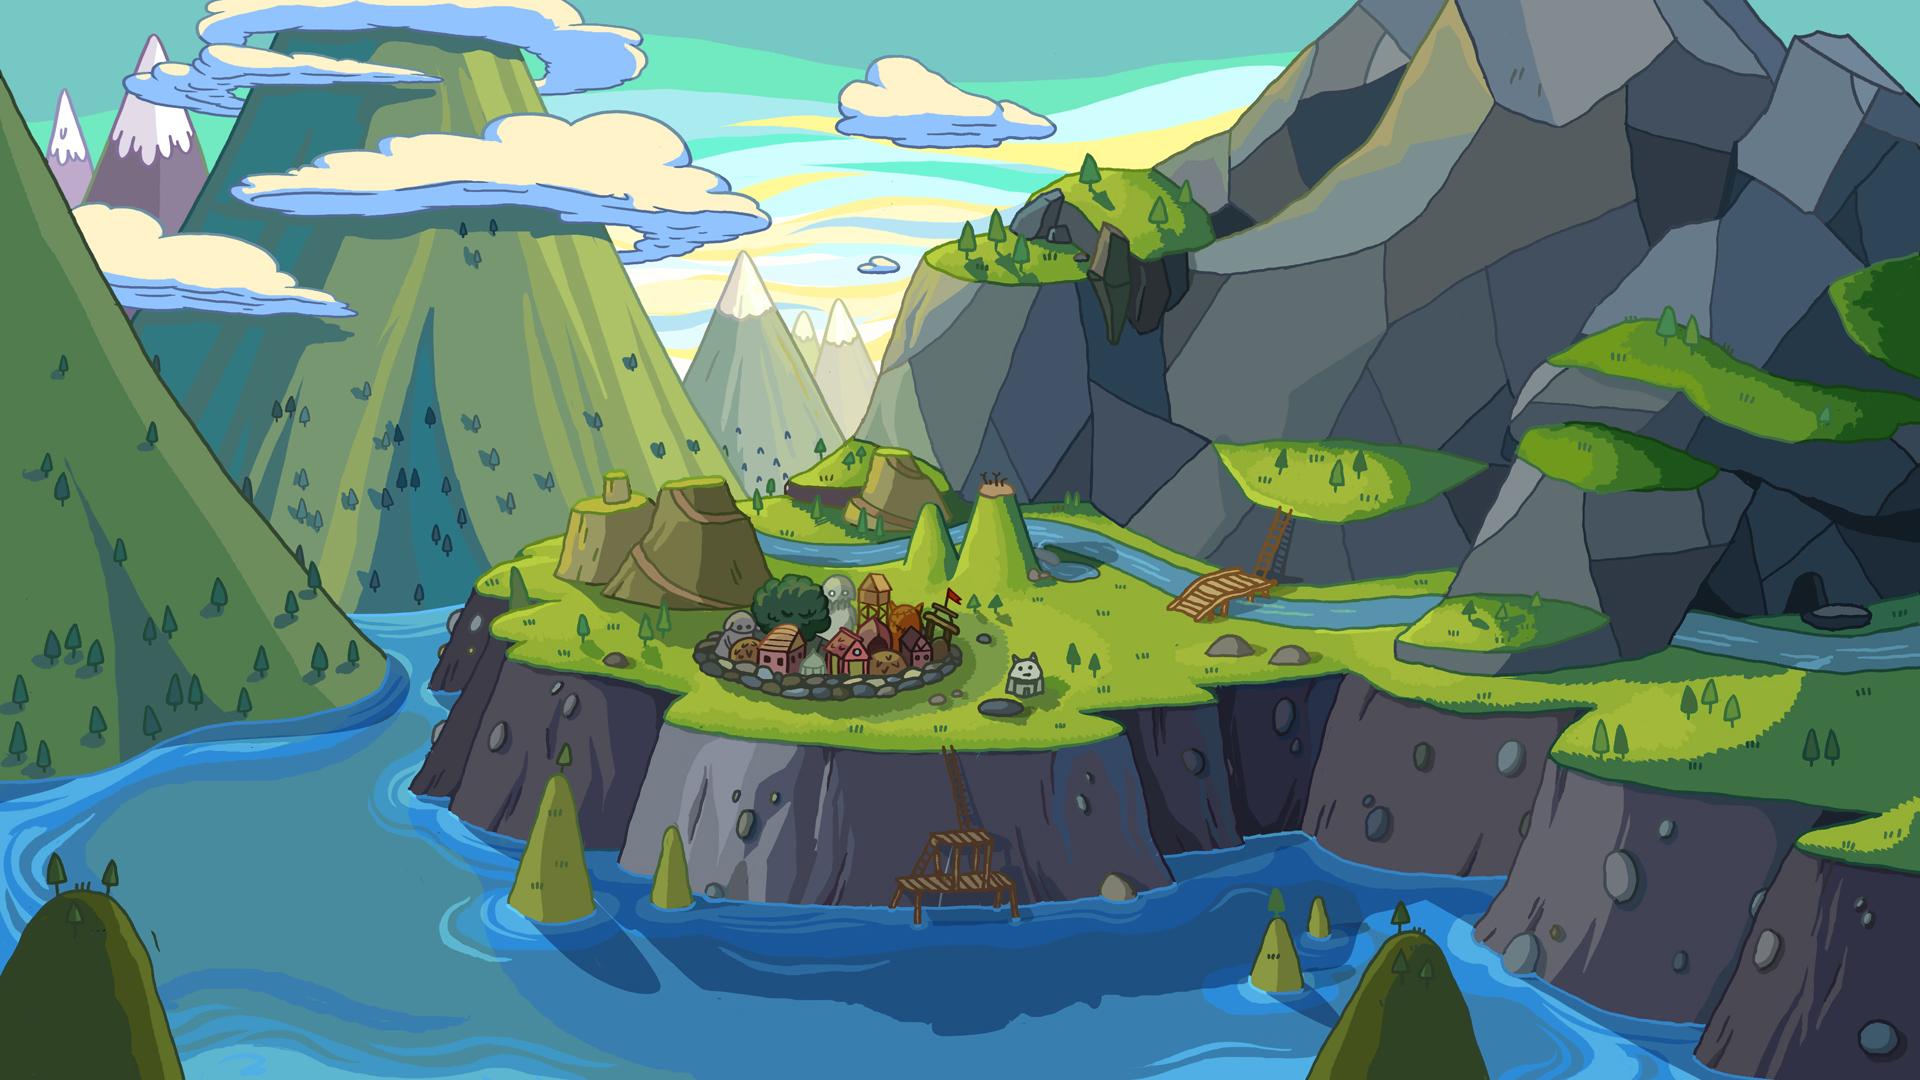 Adventure Time Computer Wallpapers Desktop Backgrounds 1920x1080 1920x1080